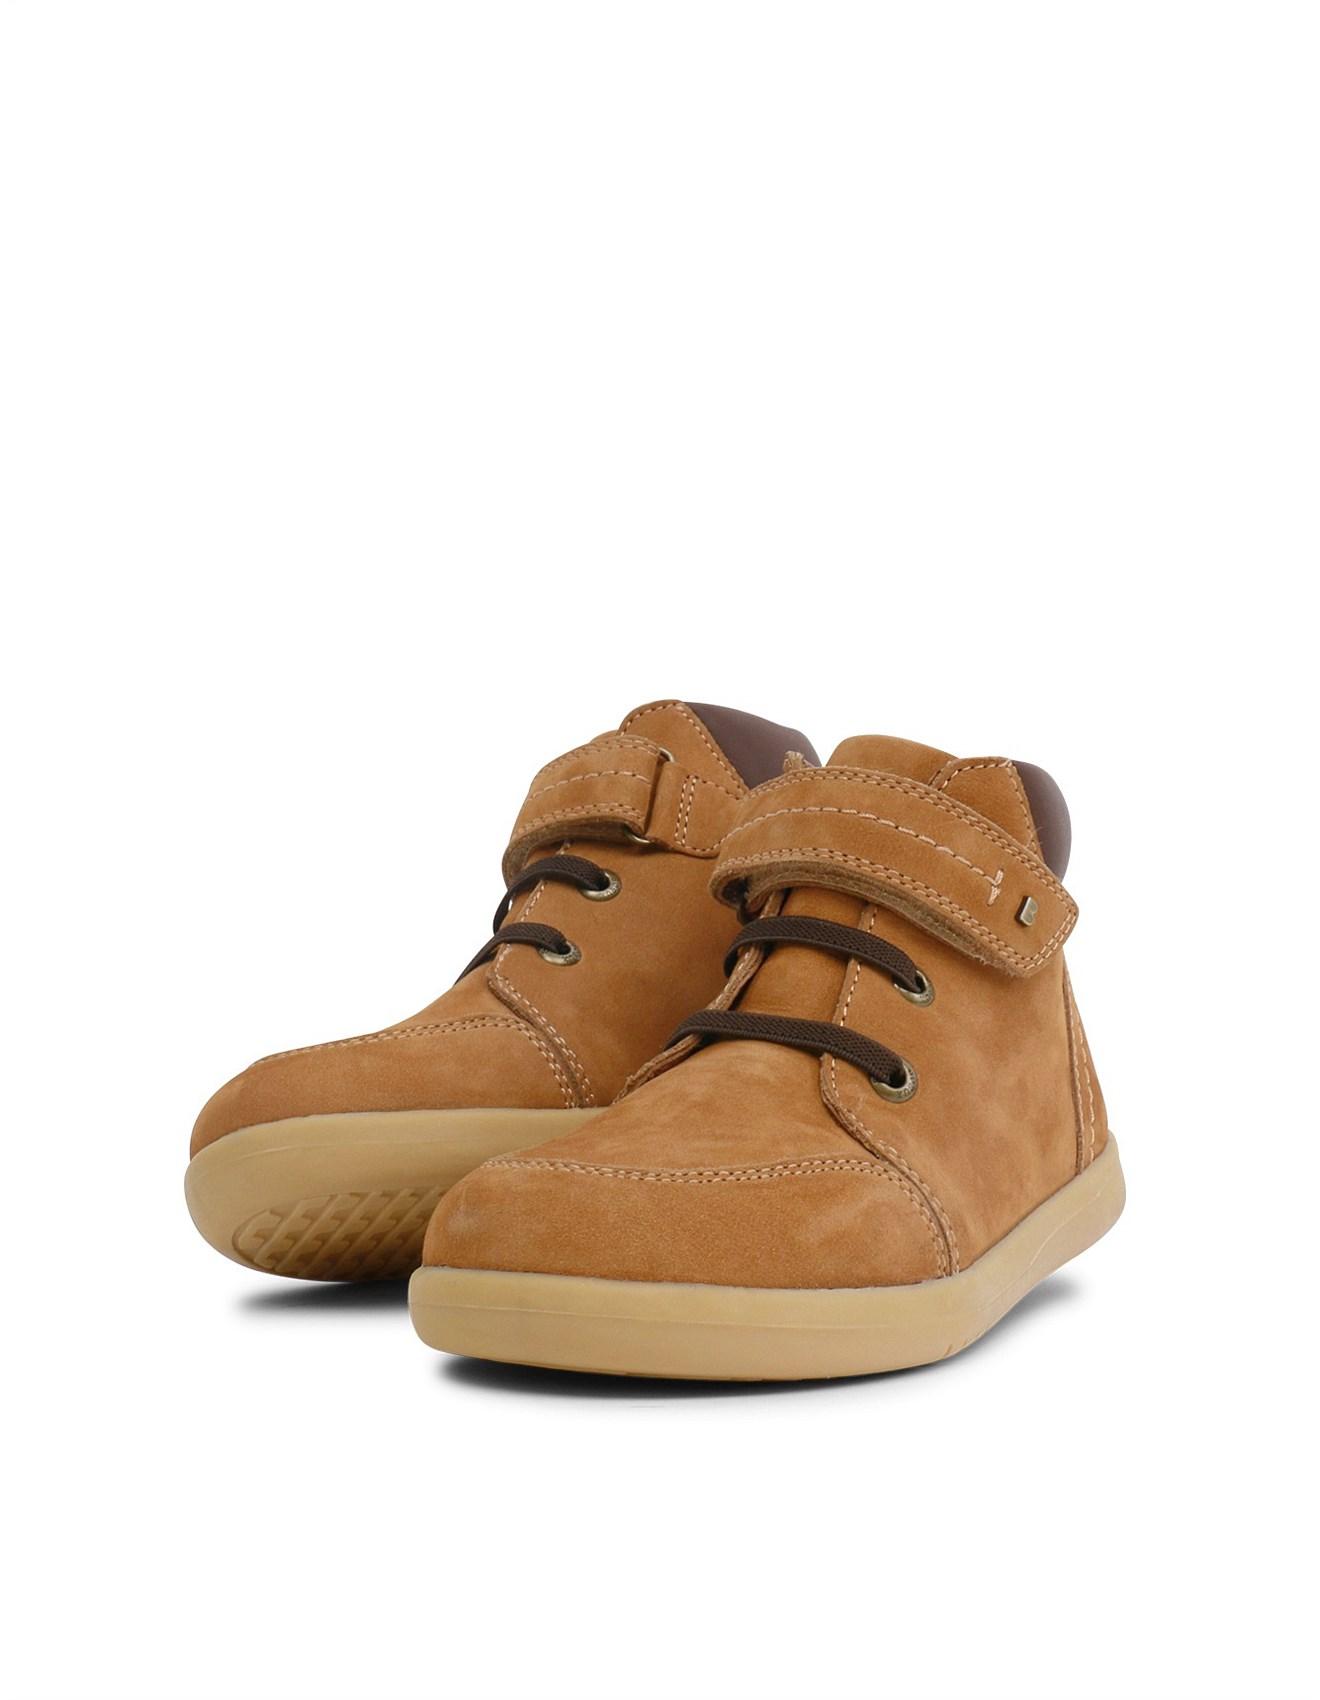 9cddf60380137 Timber Boot Mustard